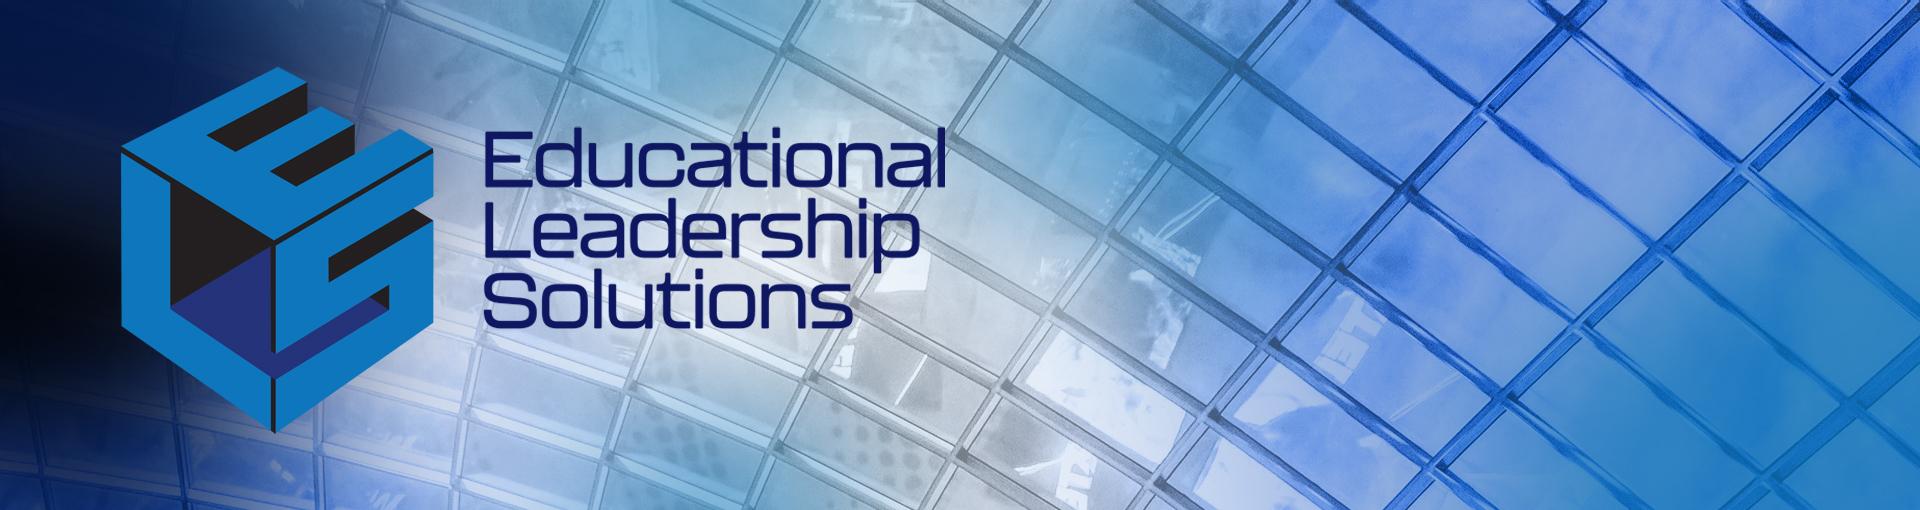 Educational Leadership Solutions